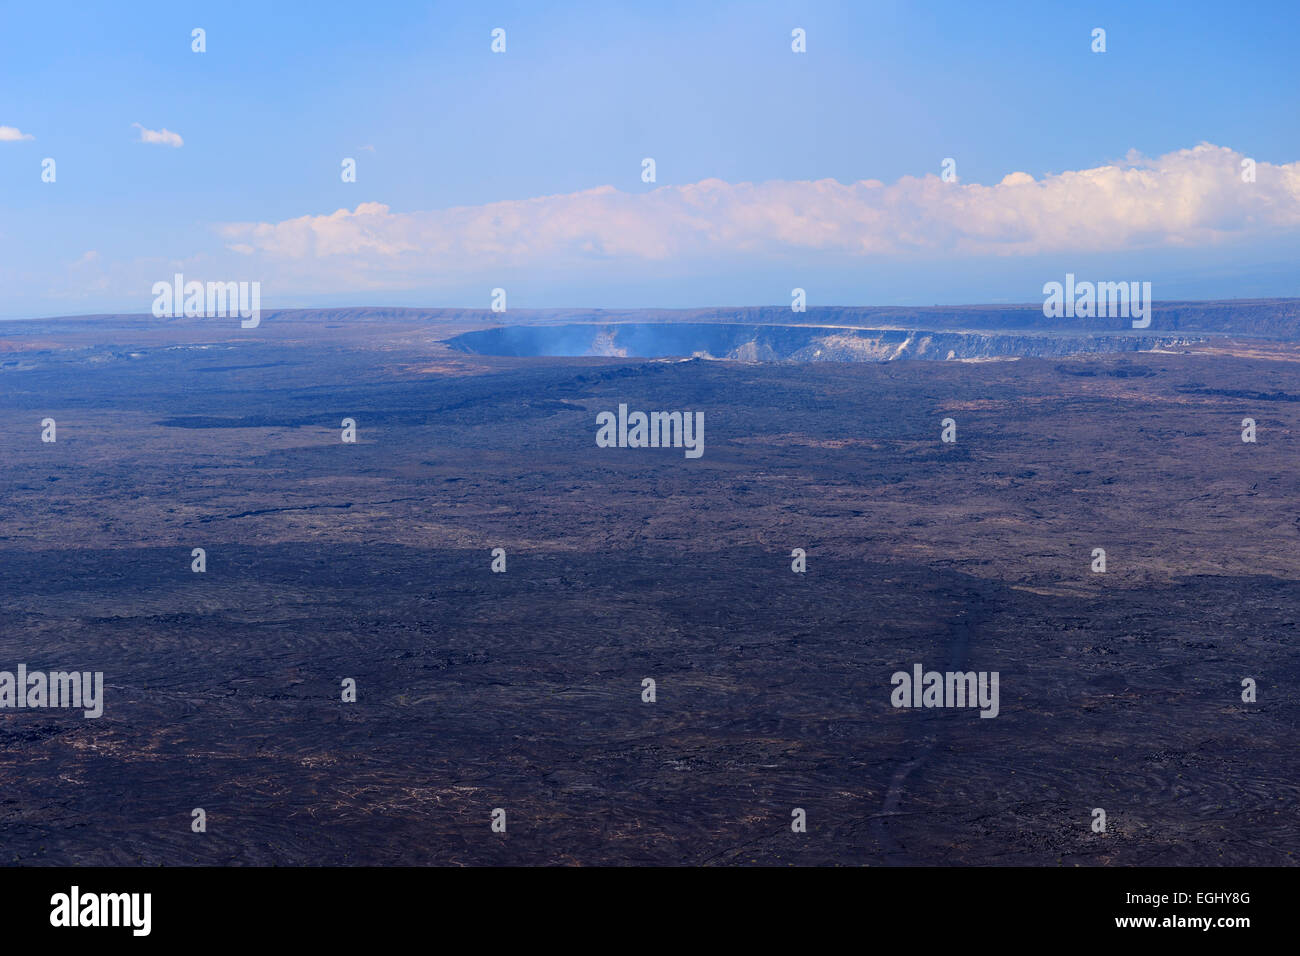 Halema'uma'u crater looking across Kilauea caldera - Volcanoes National Park, Big Island, Hawaii, USA - Stock Image